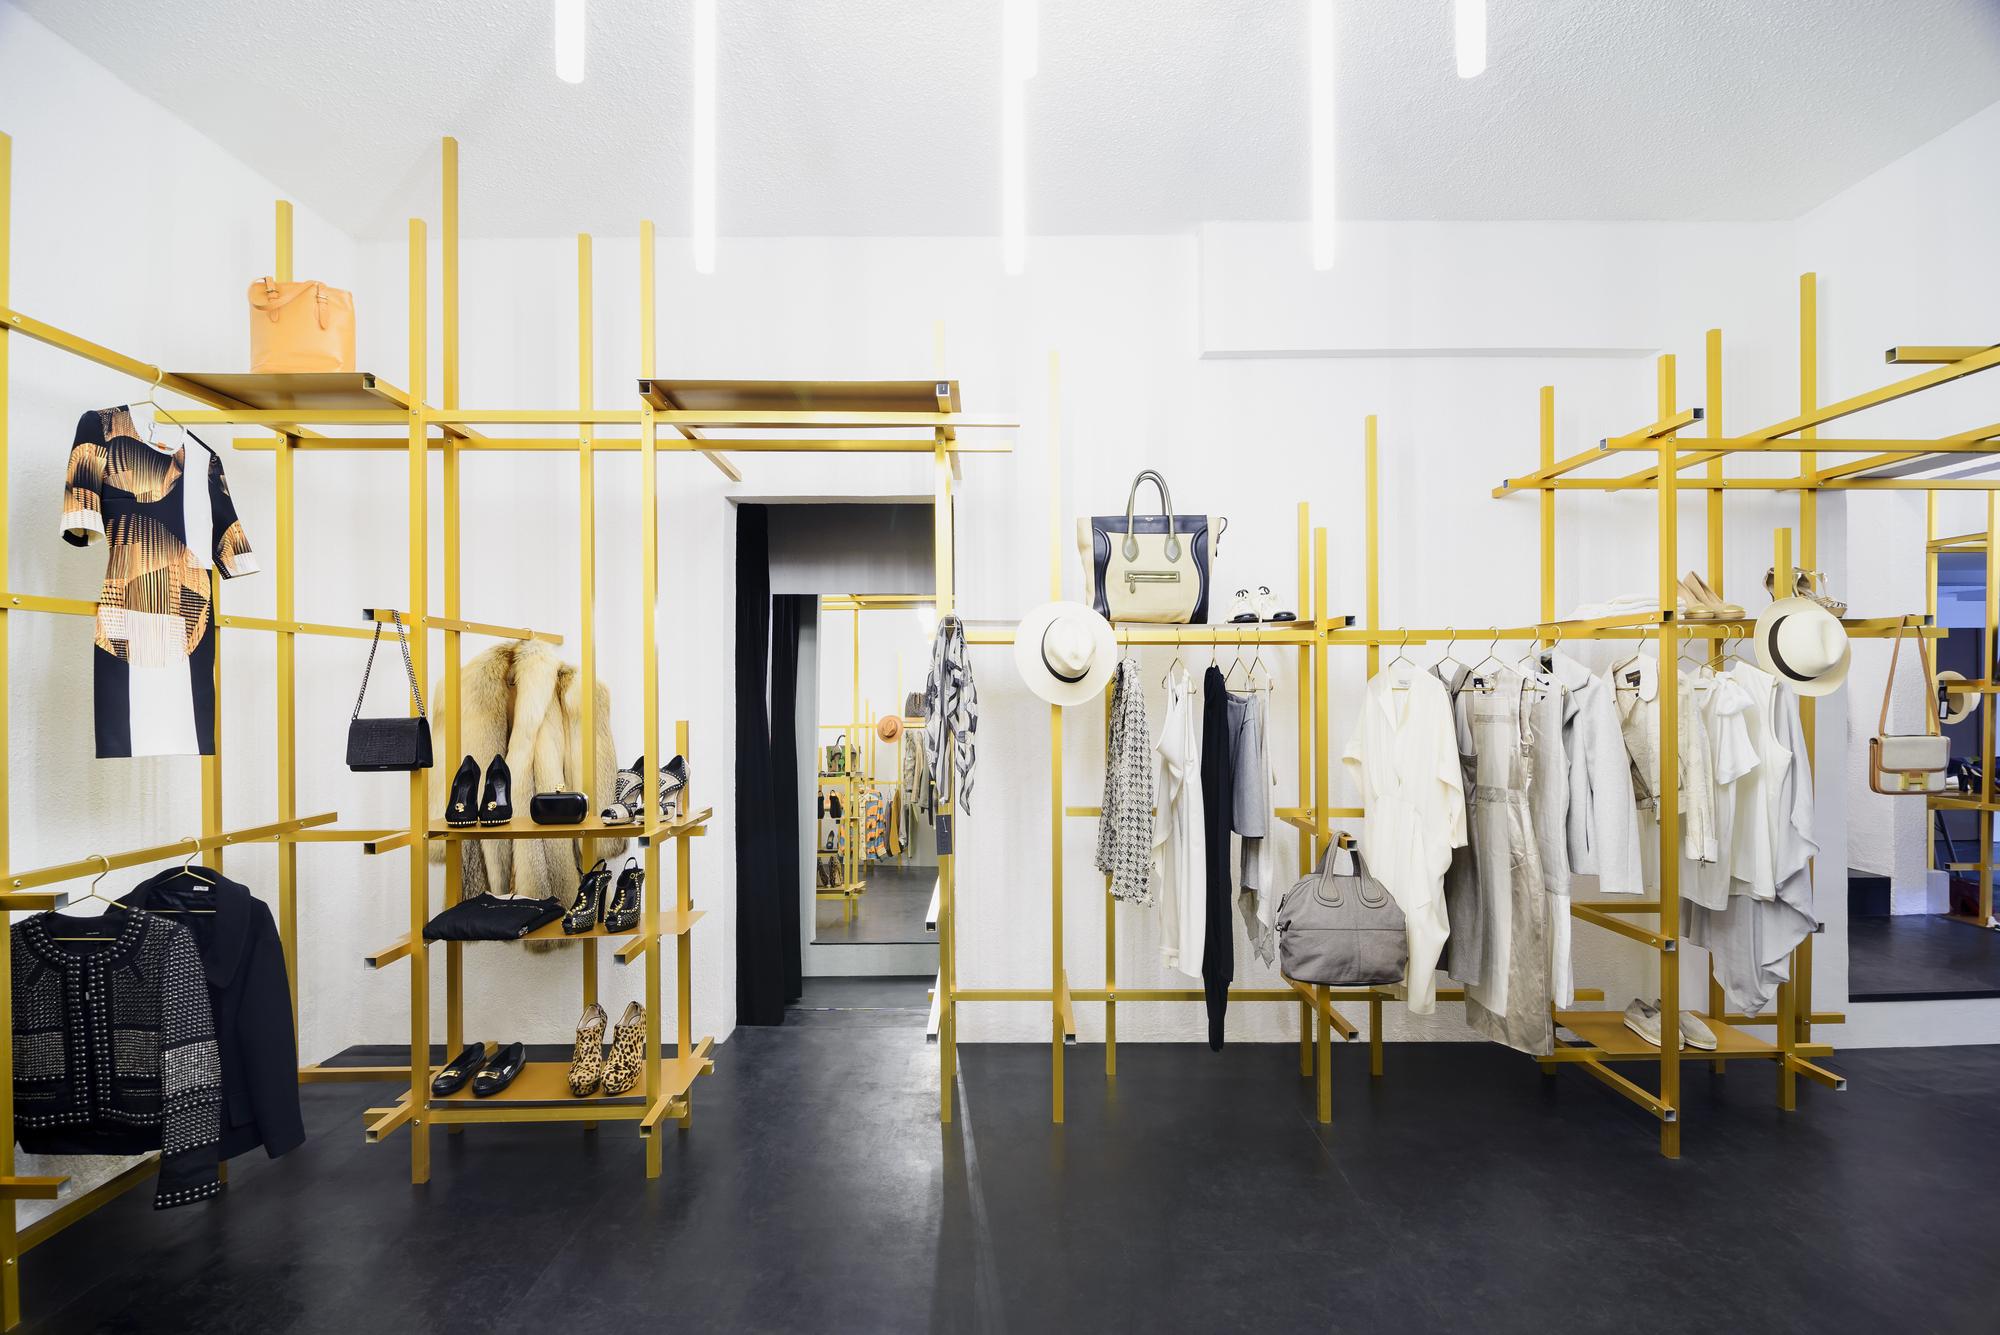 Studio s fashion house 66